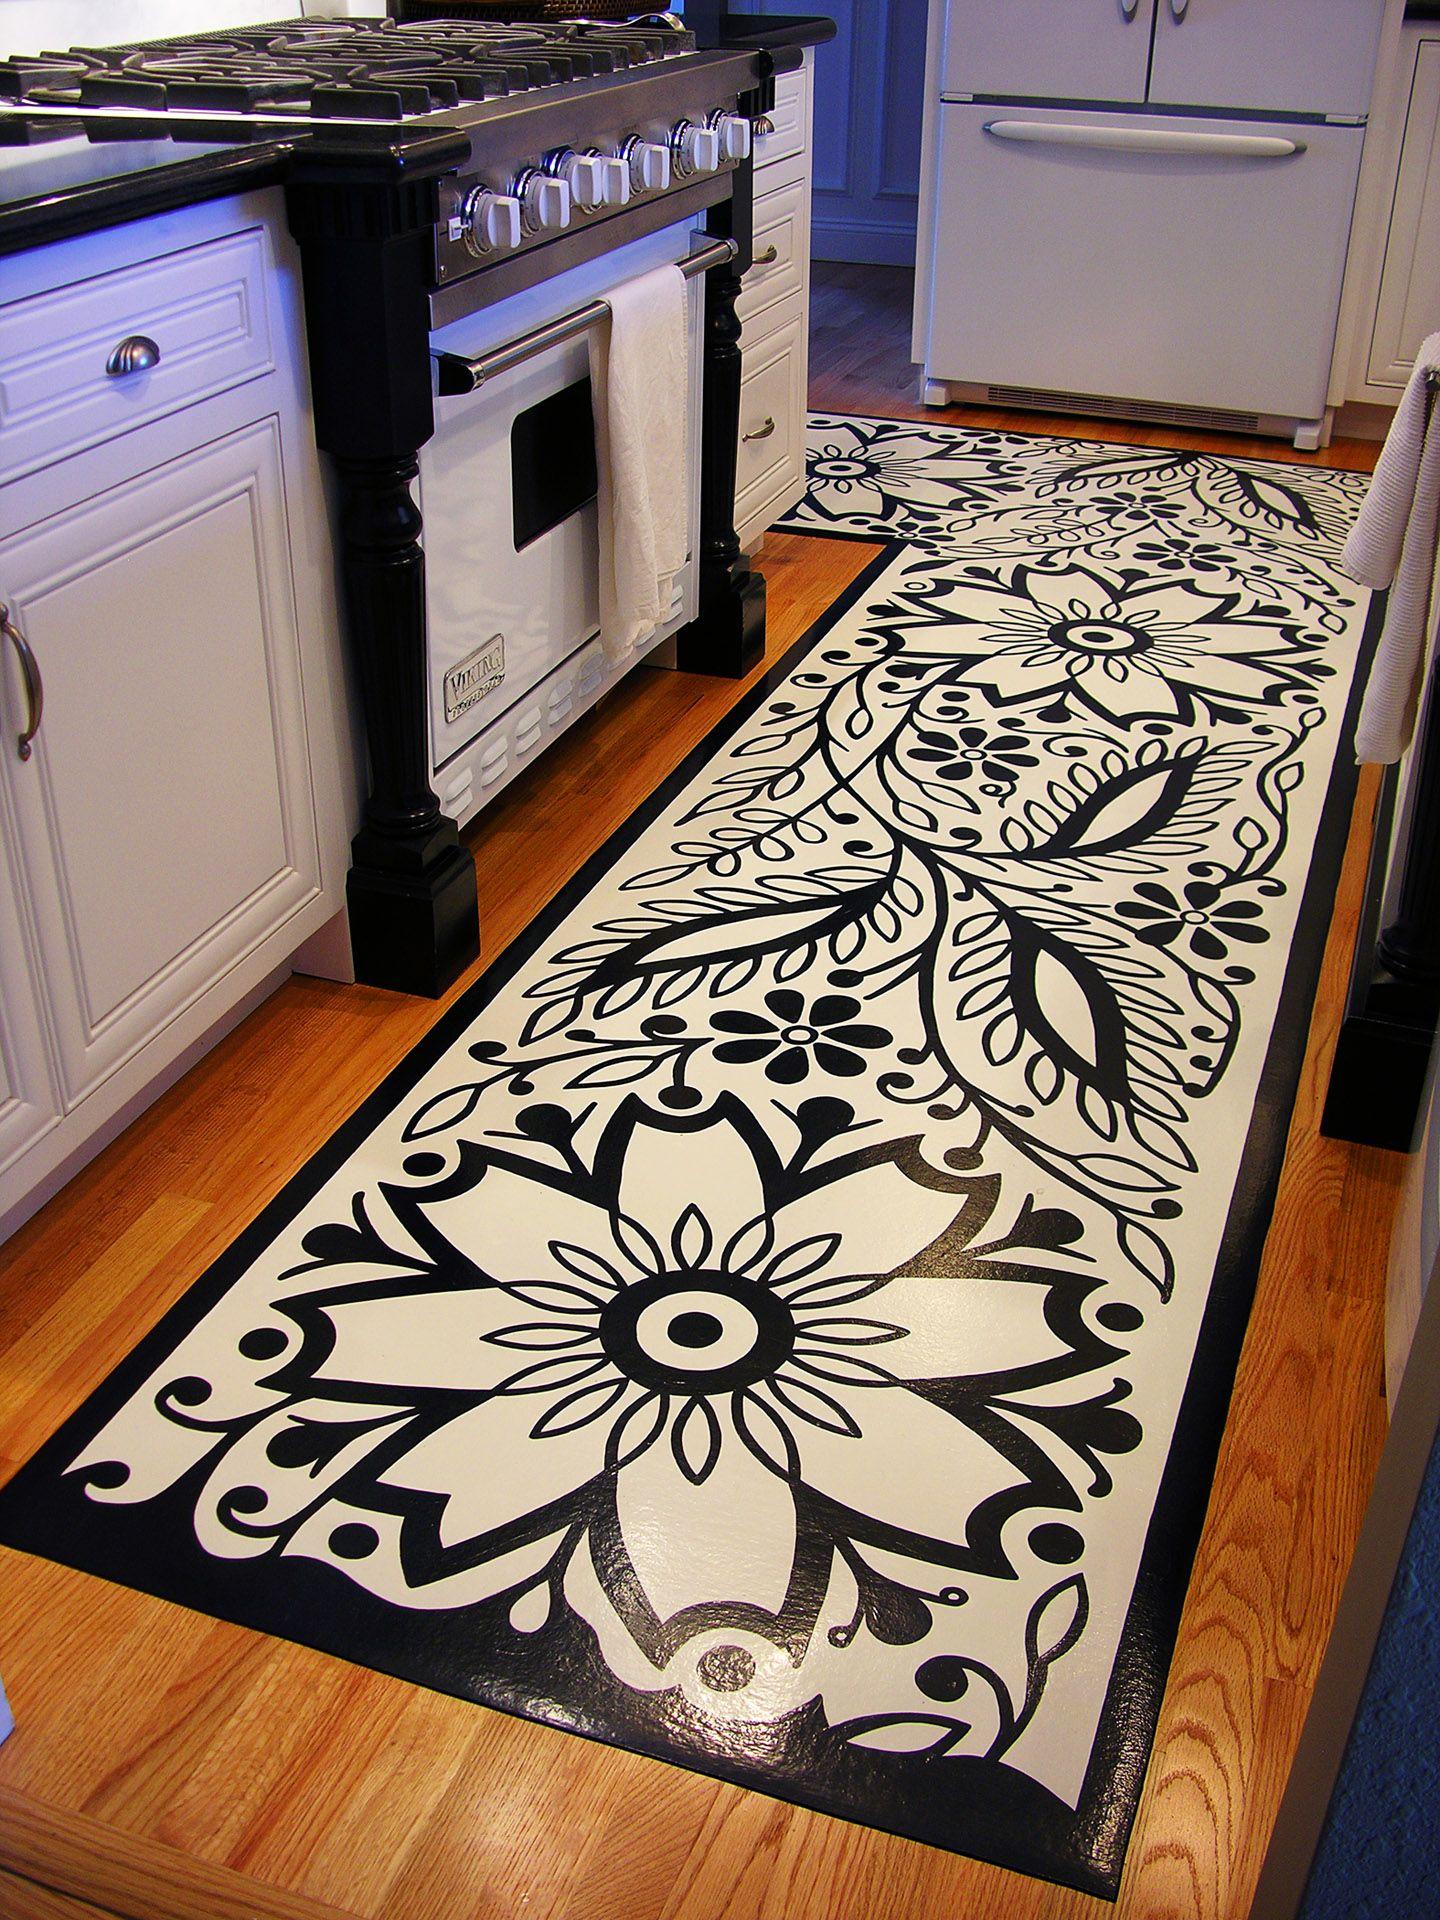 vinyl floors kitchen floor mats 17 best images about Vinyl Floors on Pinterest Ceramics Baroque and Plank flooring